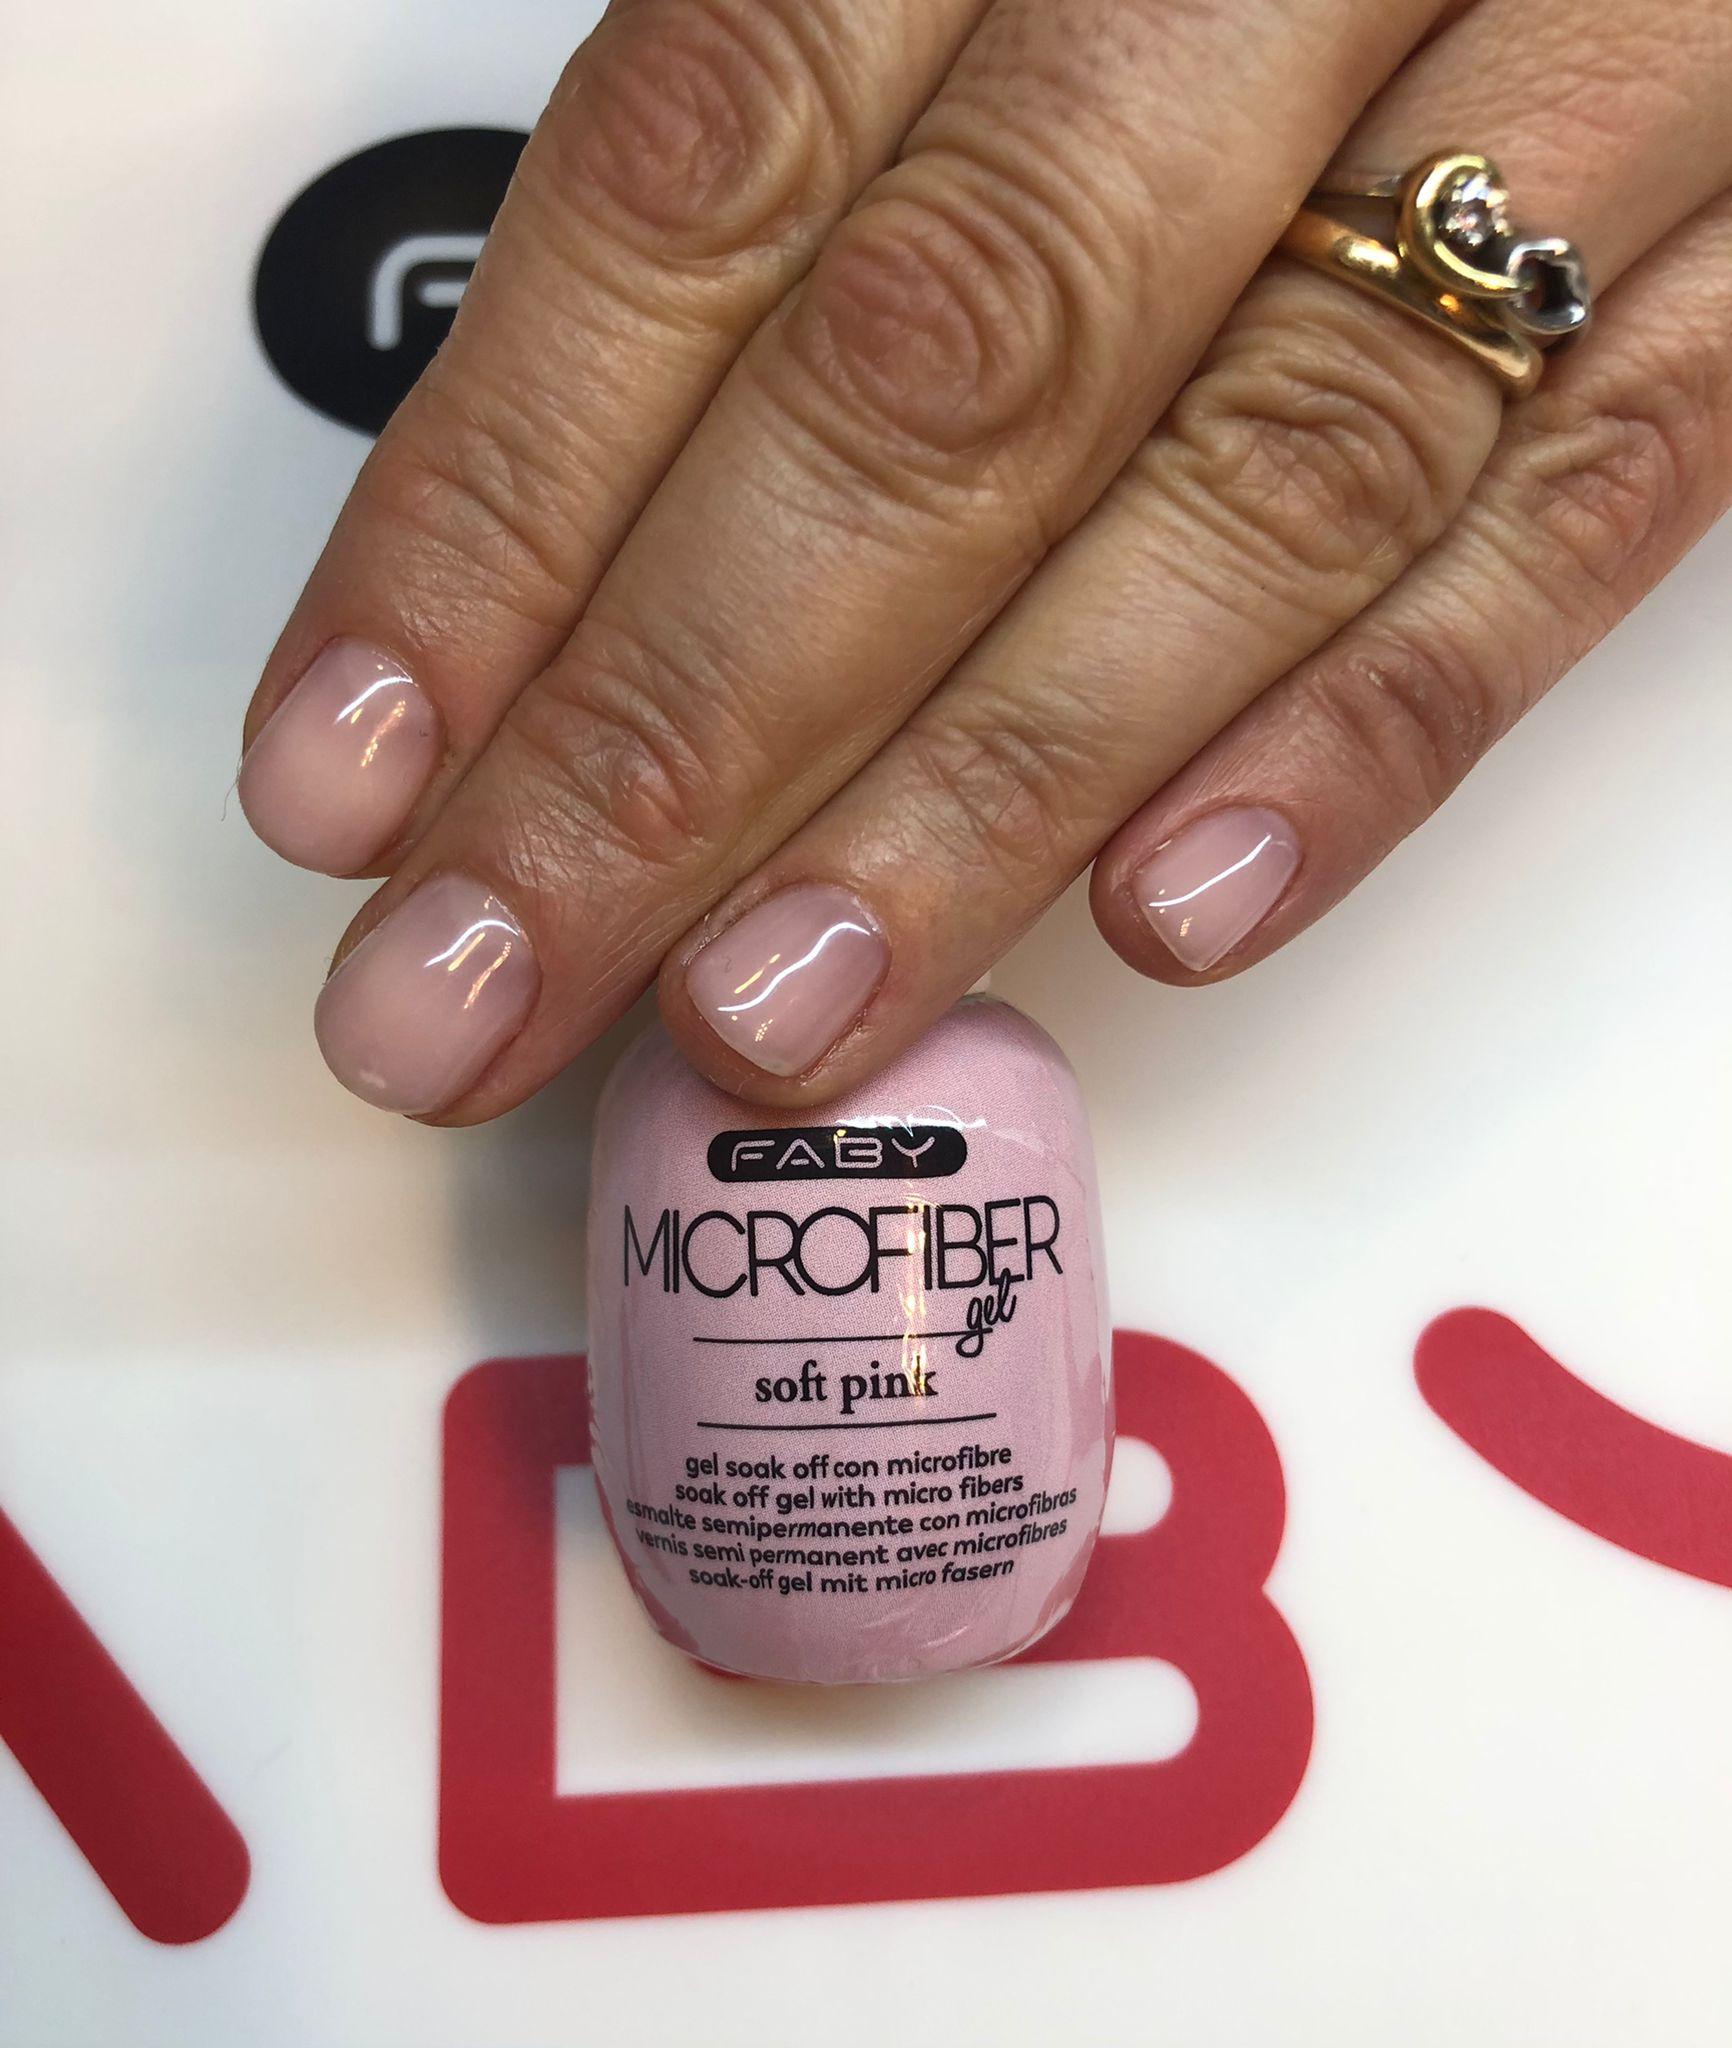 Microfiber Gel Soft Pink